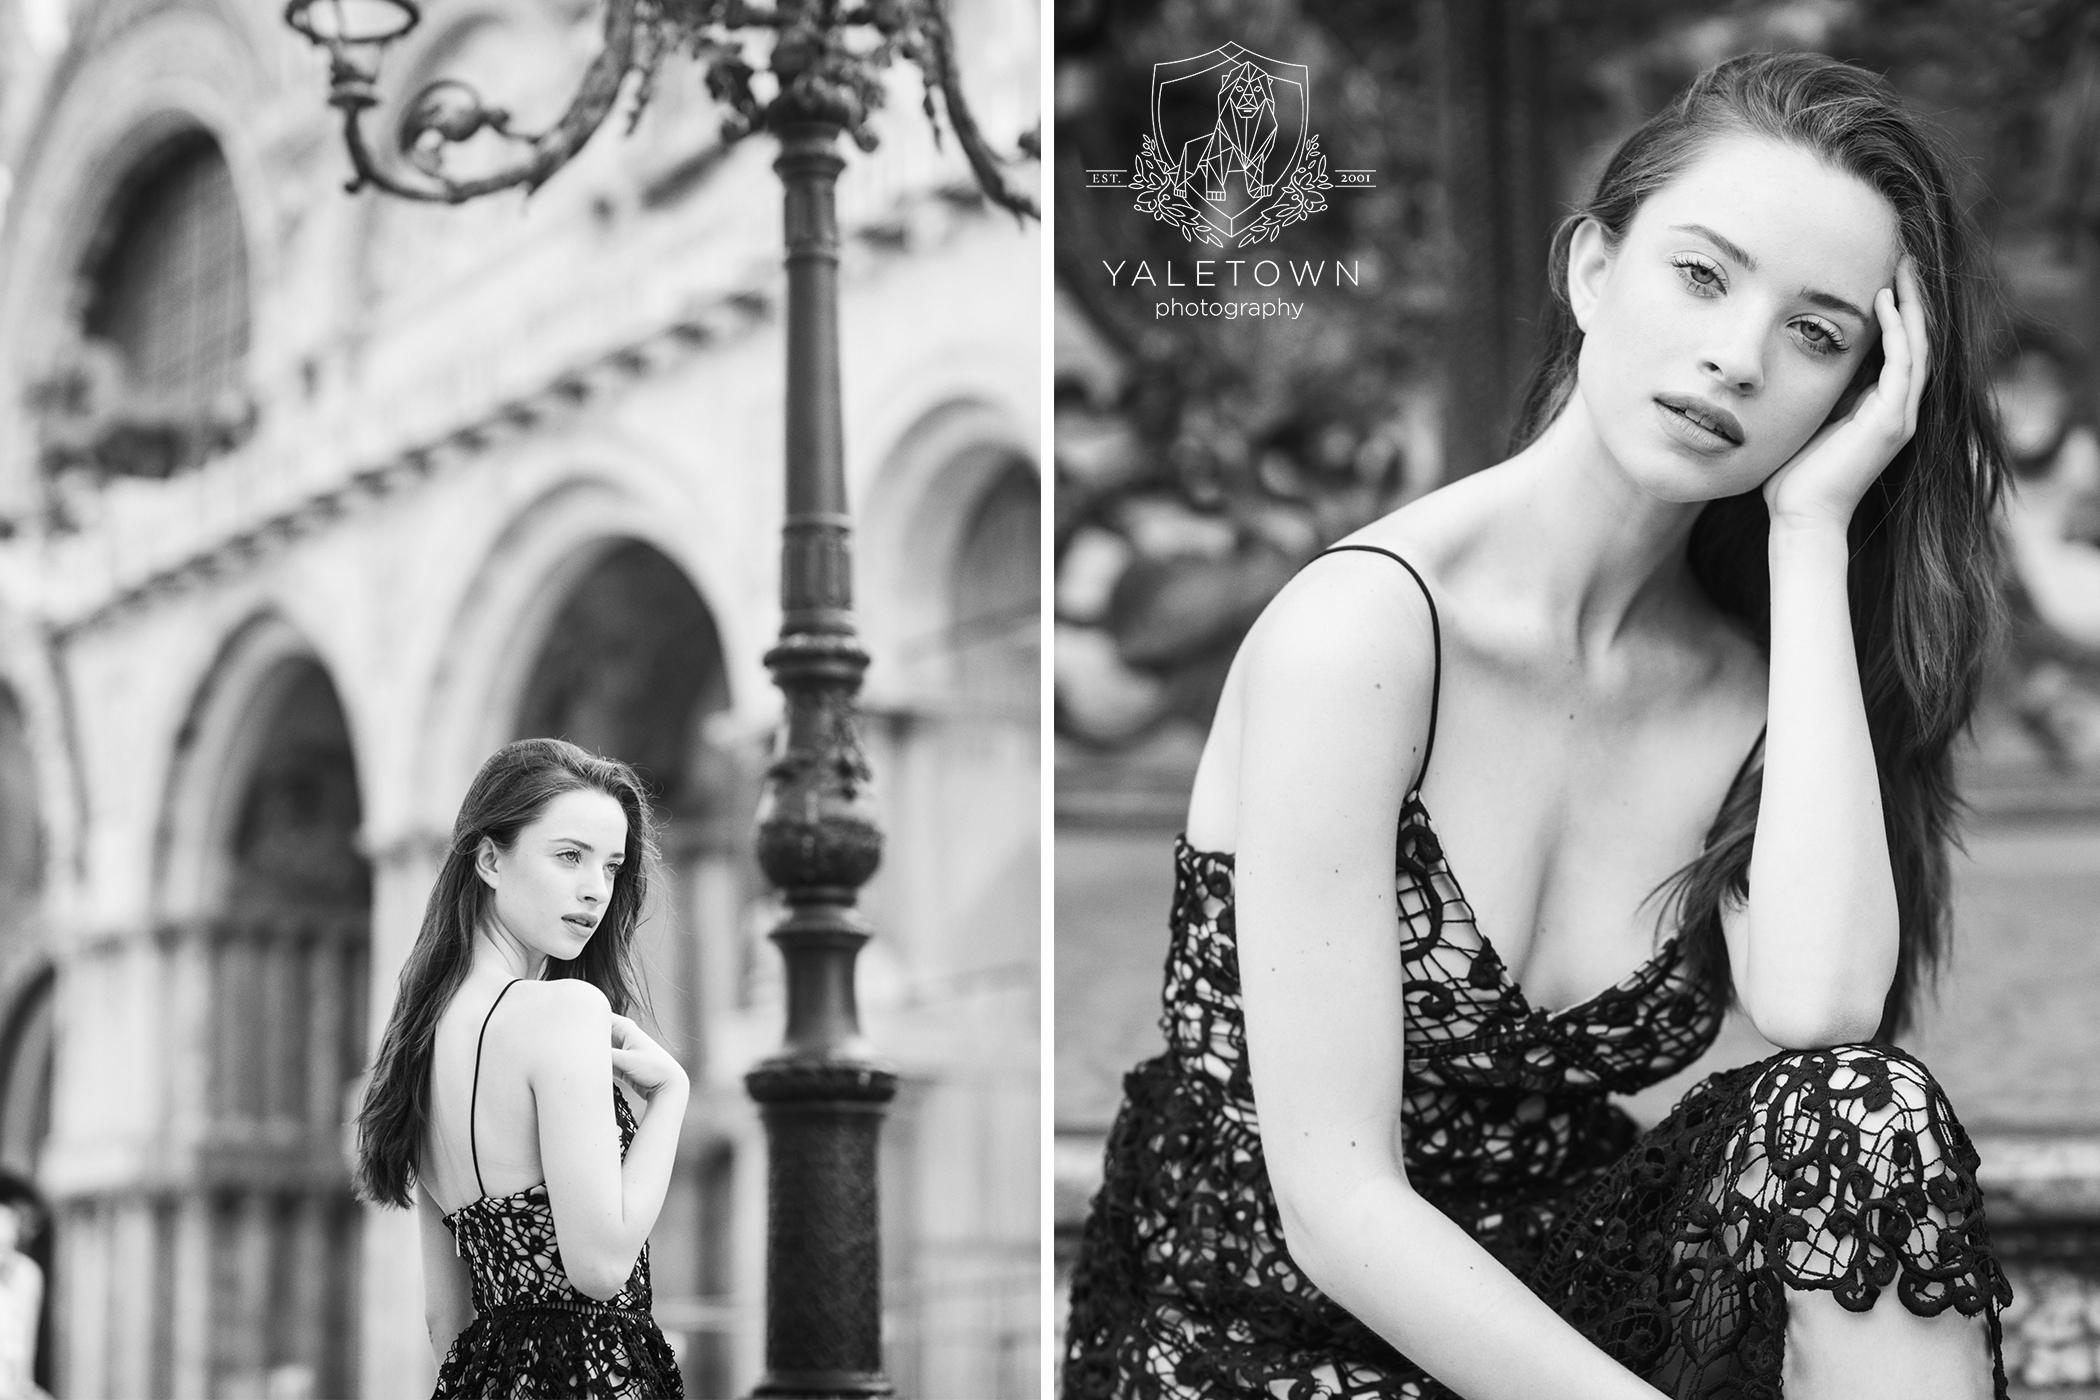 Venice-portrait-session-yaletown-photography-vacation-photographer-photo-010.jpg